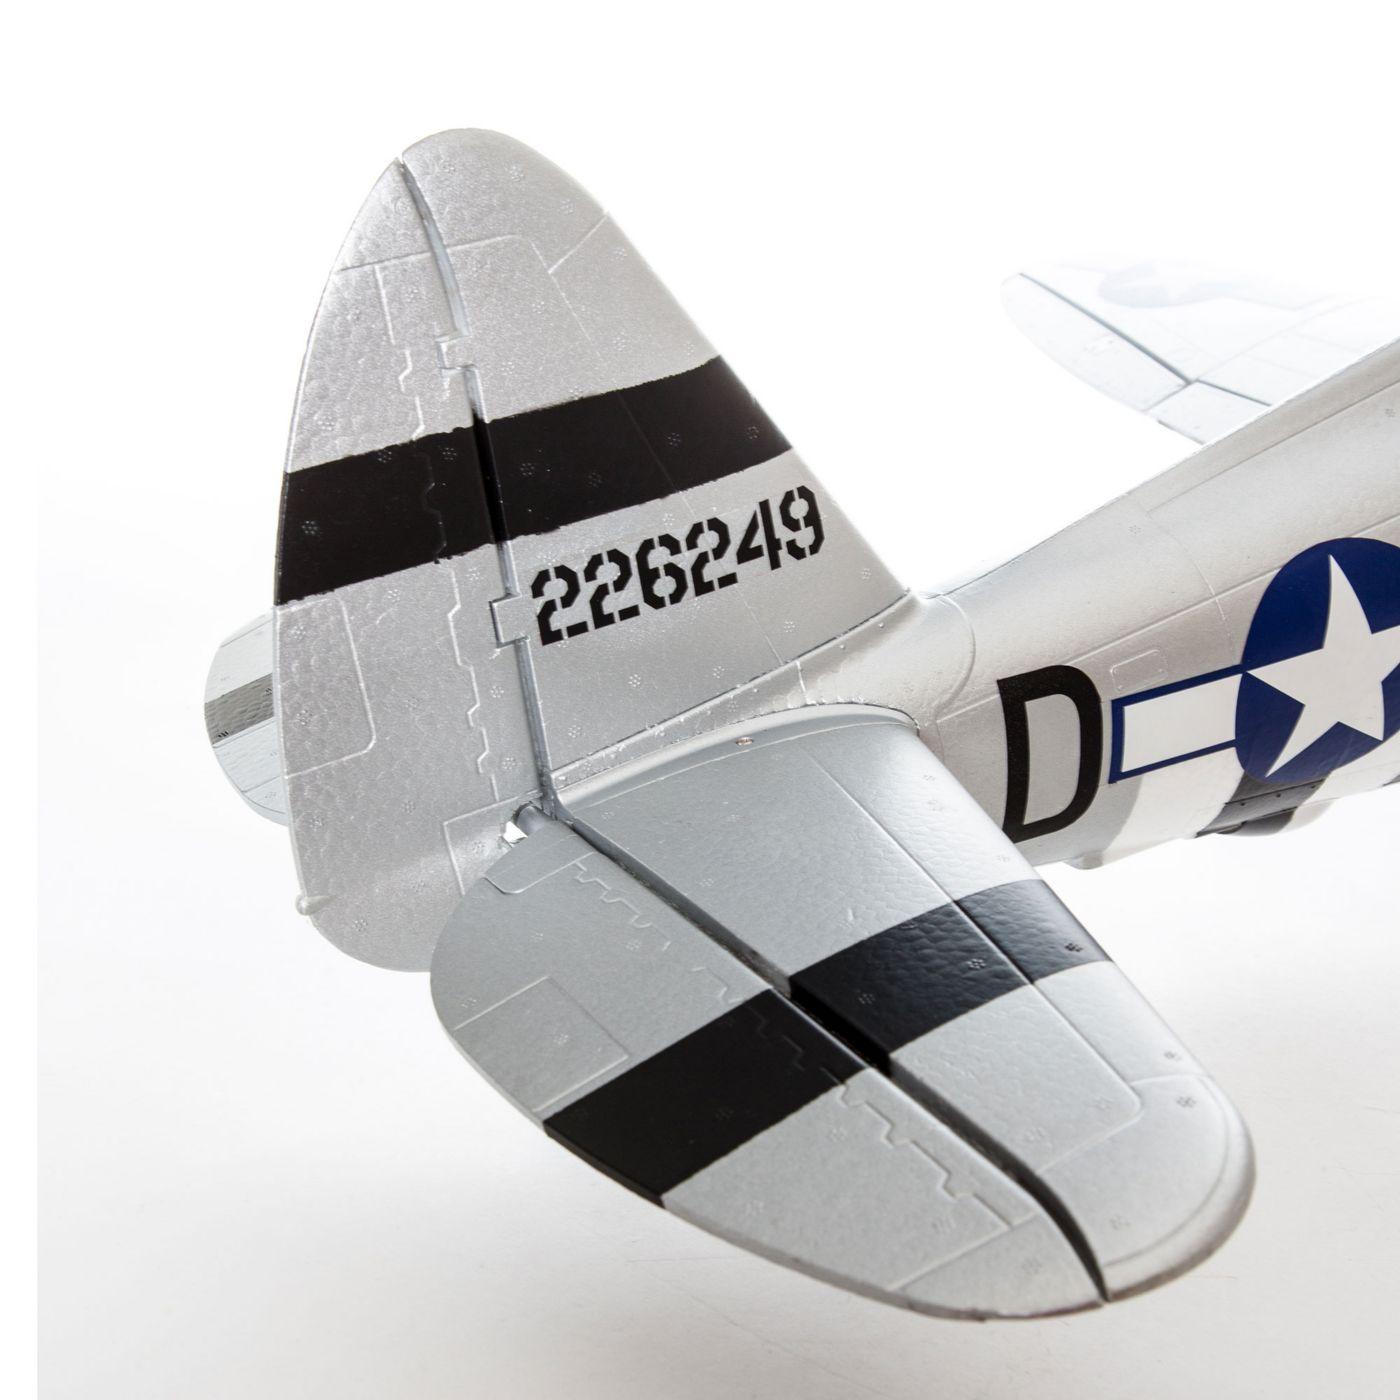 E-flite P-47 Razorback Warbird bnf basic safe 02